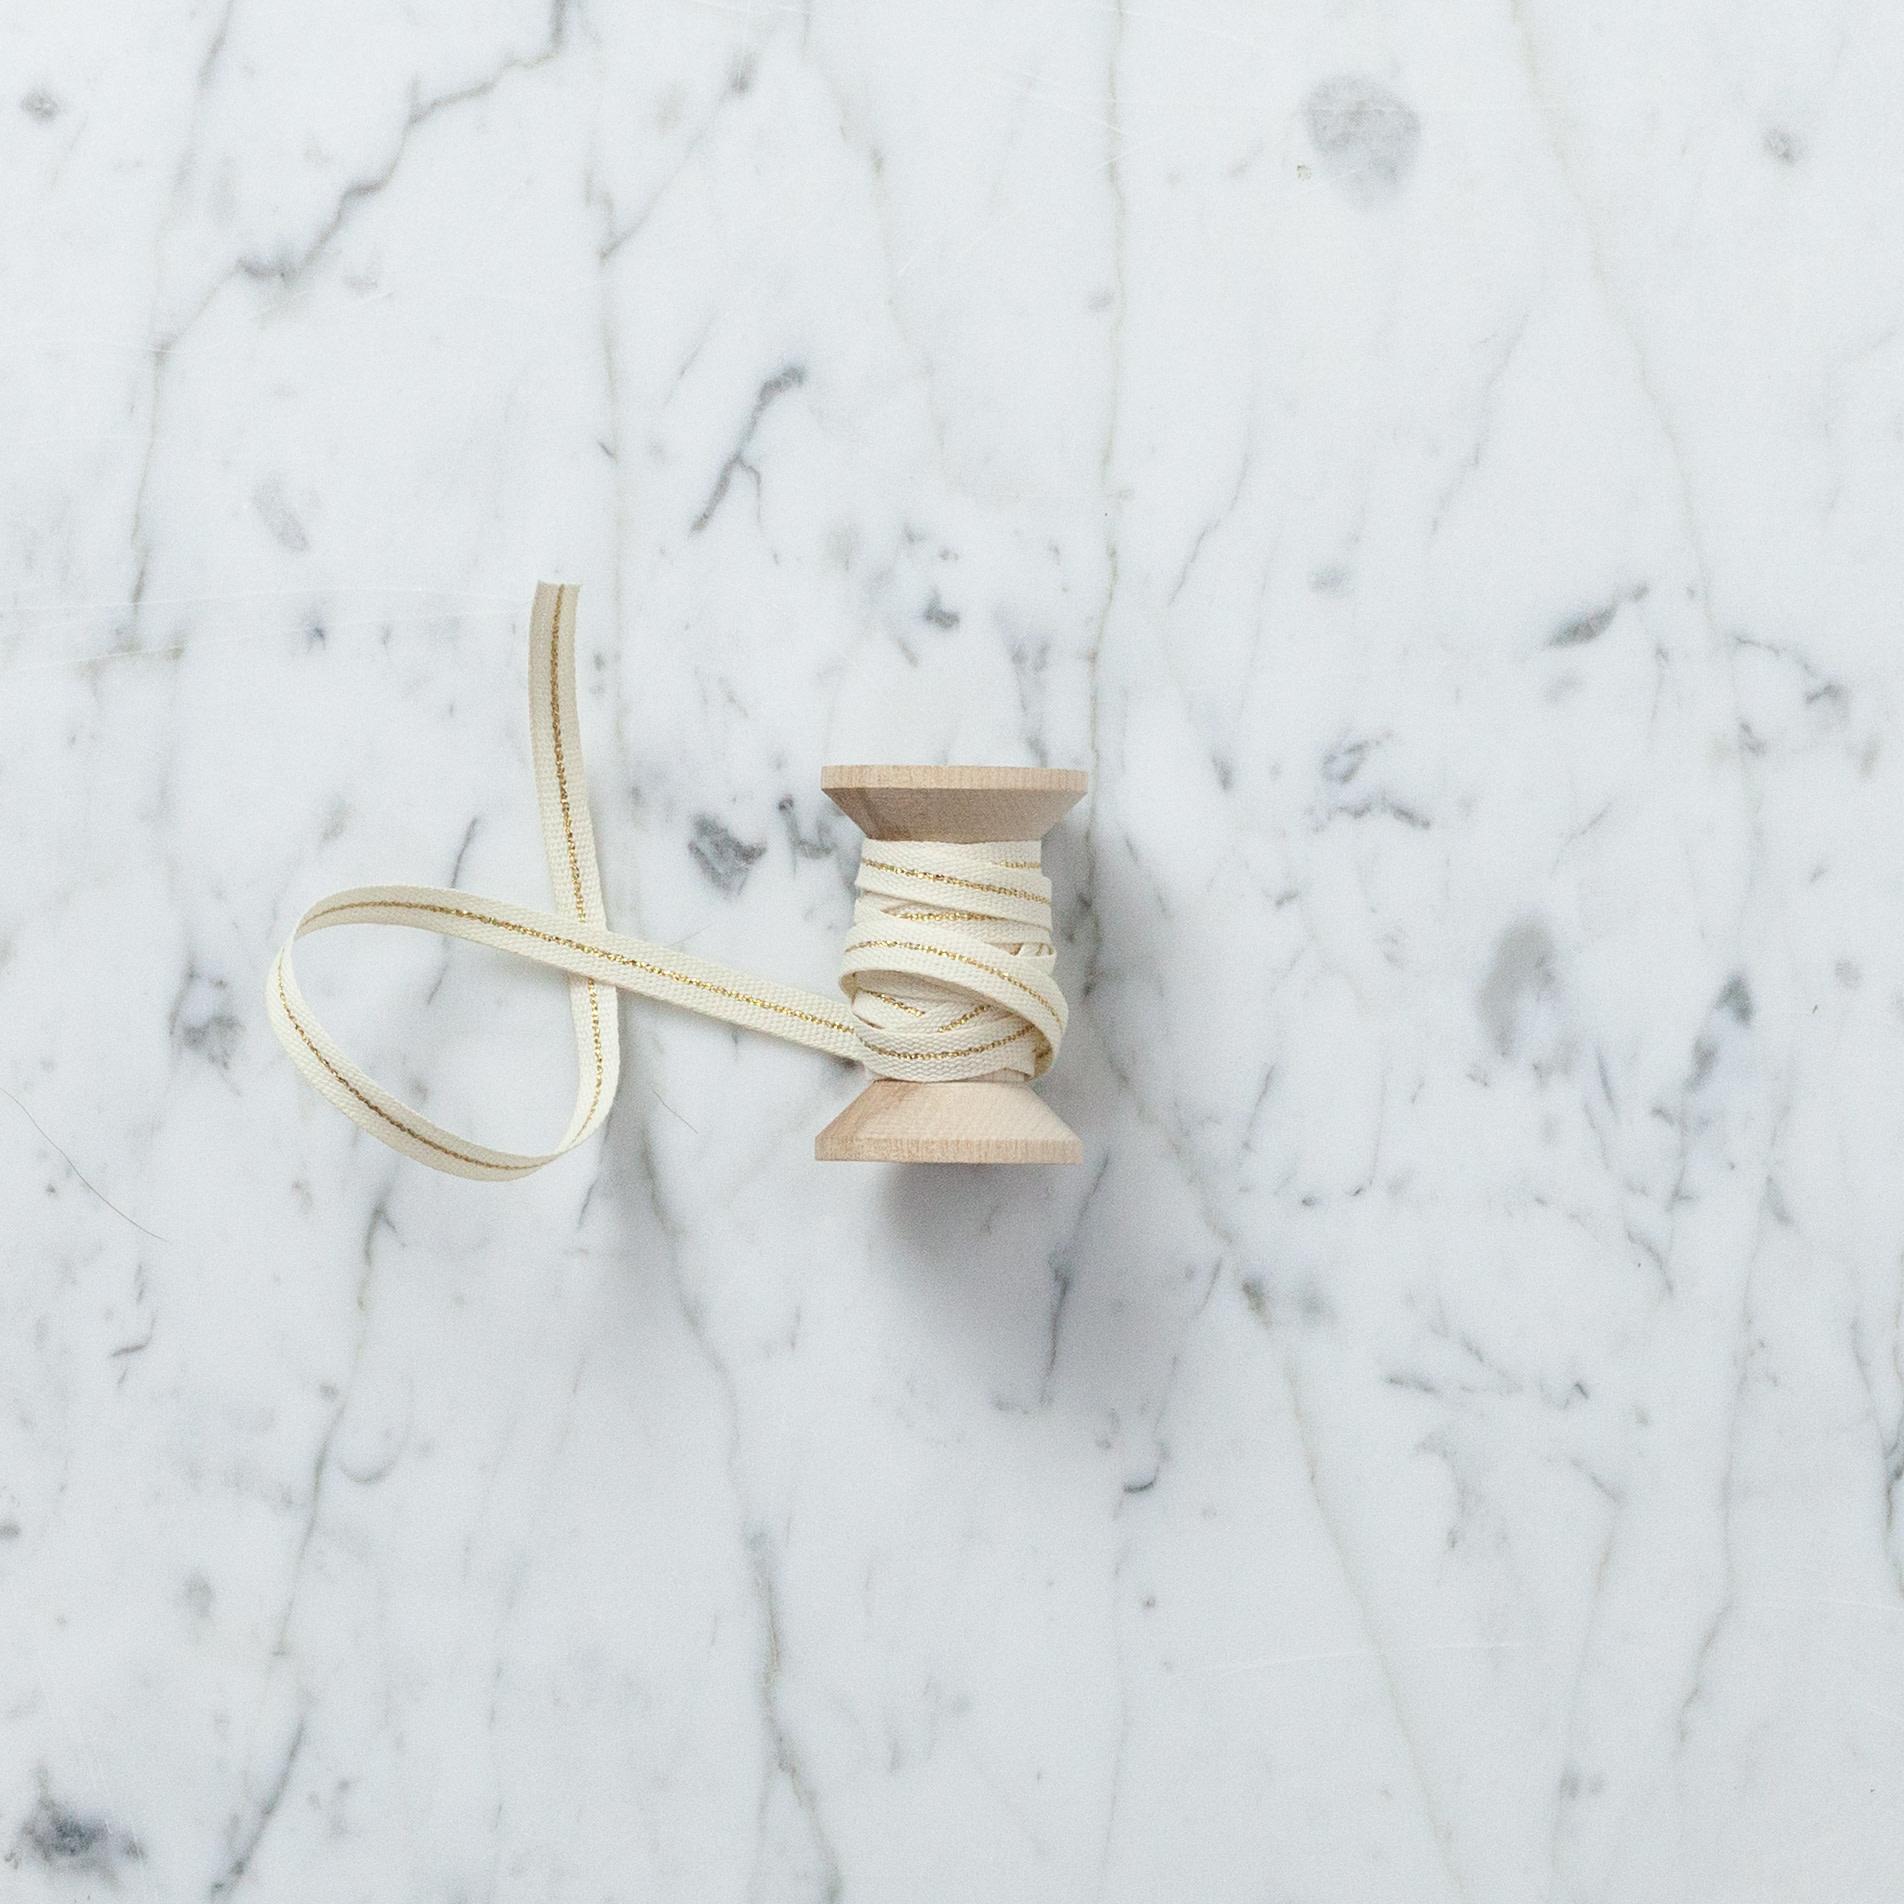 "Italian Cotton Ribbon - Cream with Metallic Gold Stripe - 1/4"" Width - Sold Per Yard"